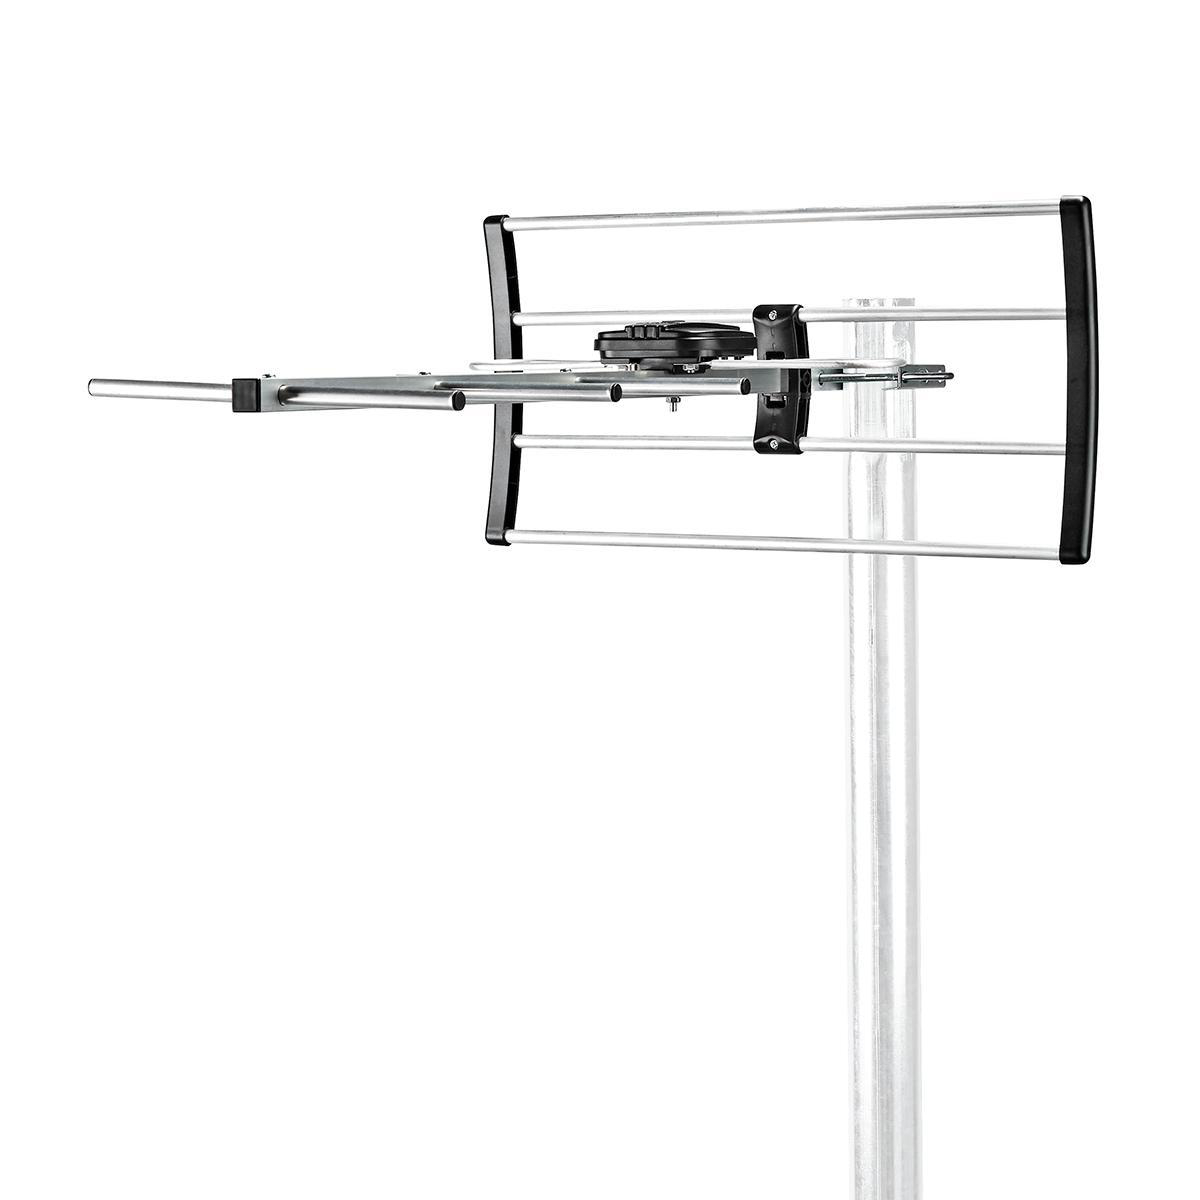 Nedis ANOR5050ME kültéri antenna